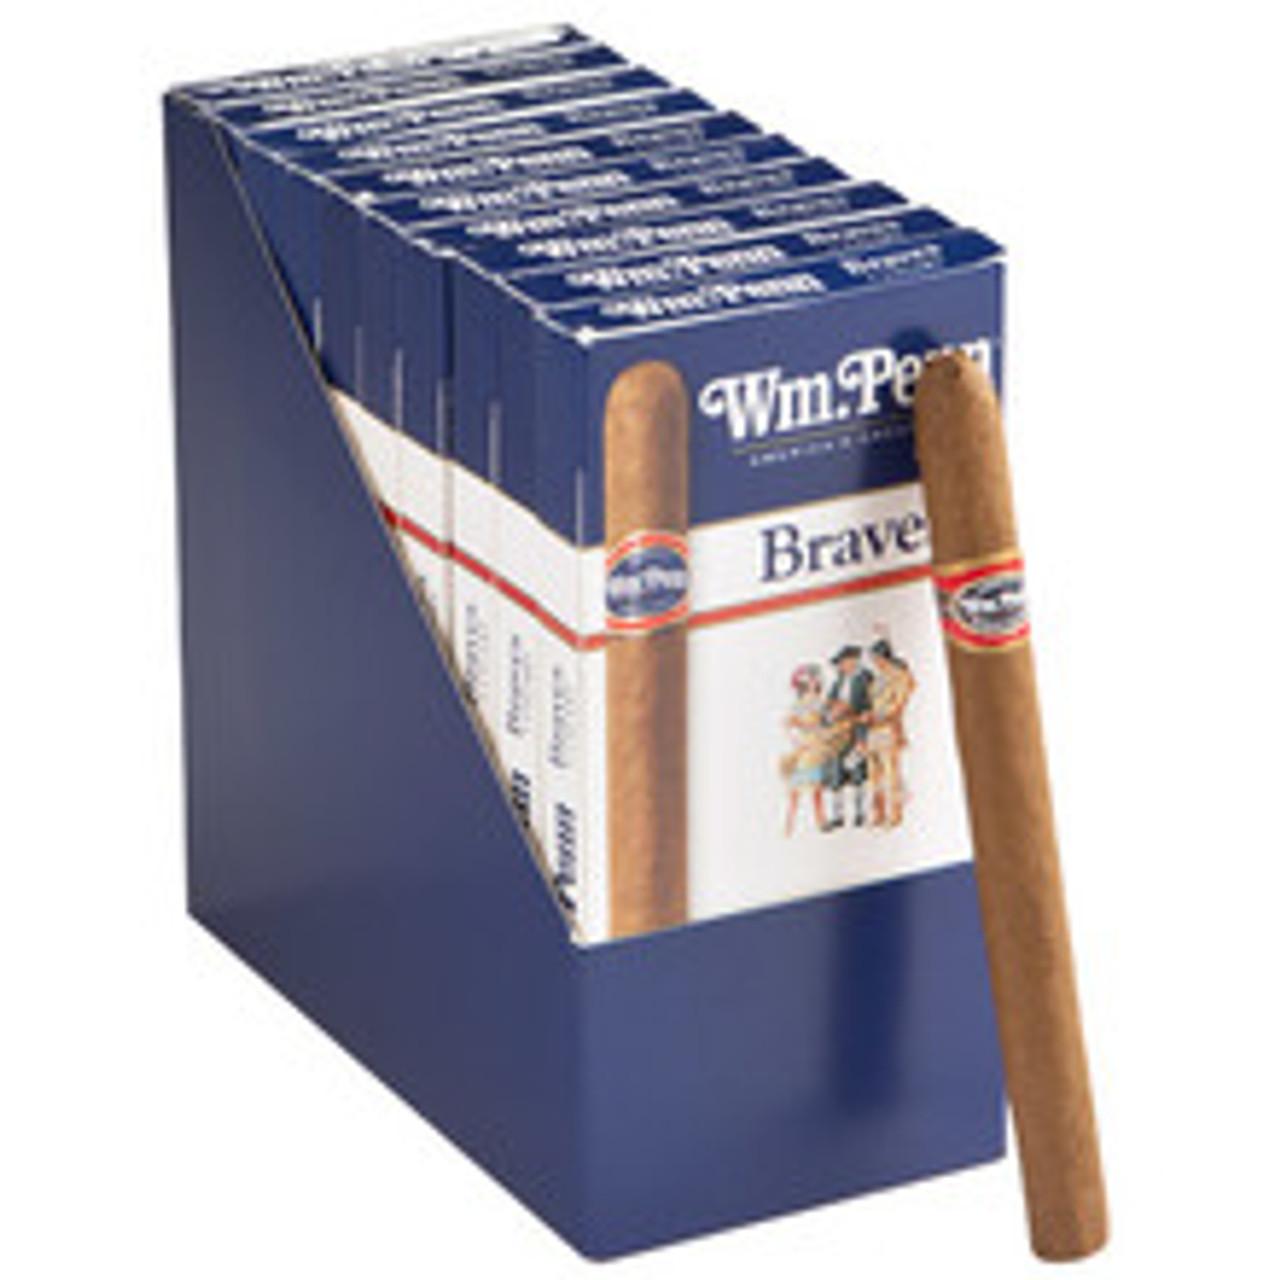 William Penn Brave Cigars (10 Packs Of 5) - Natural